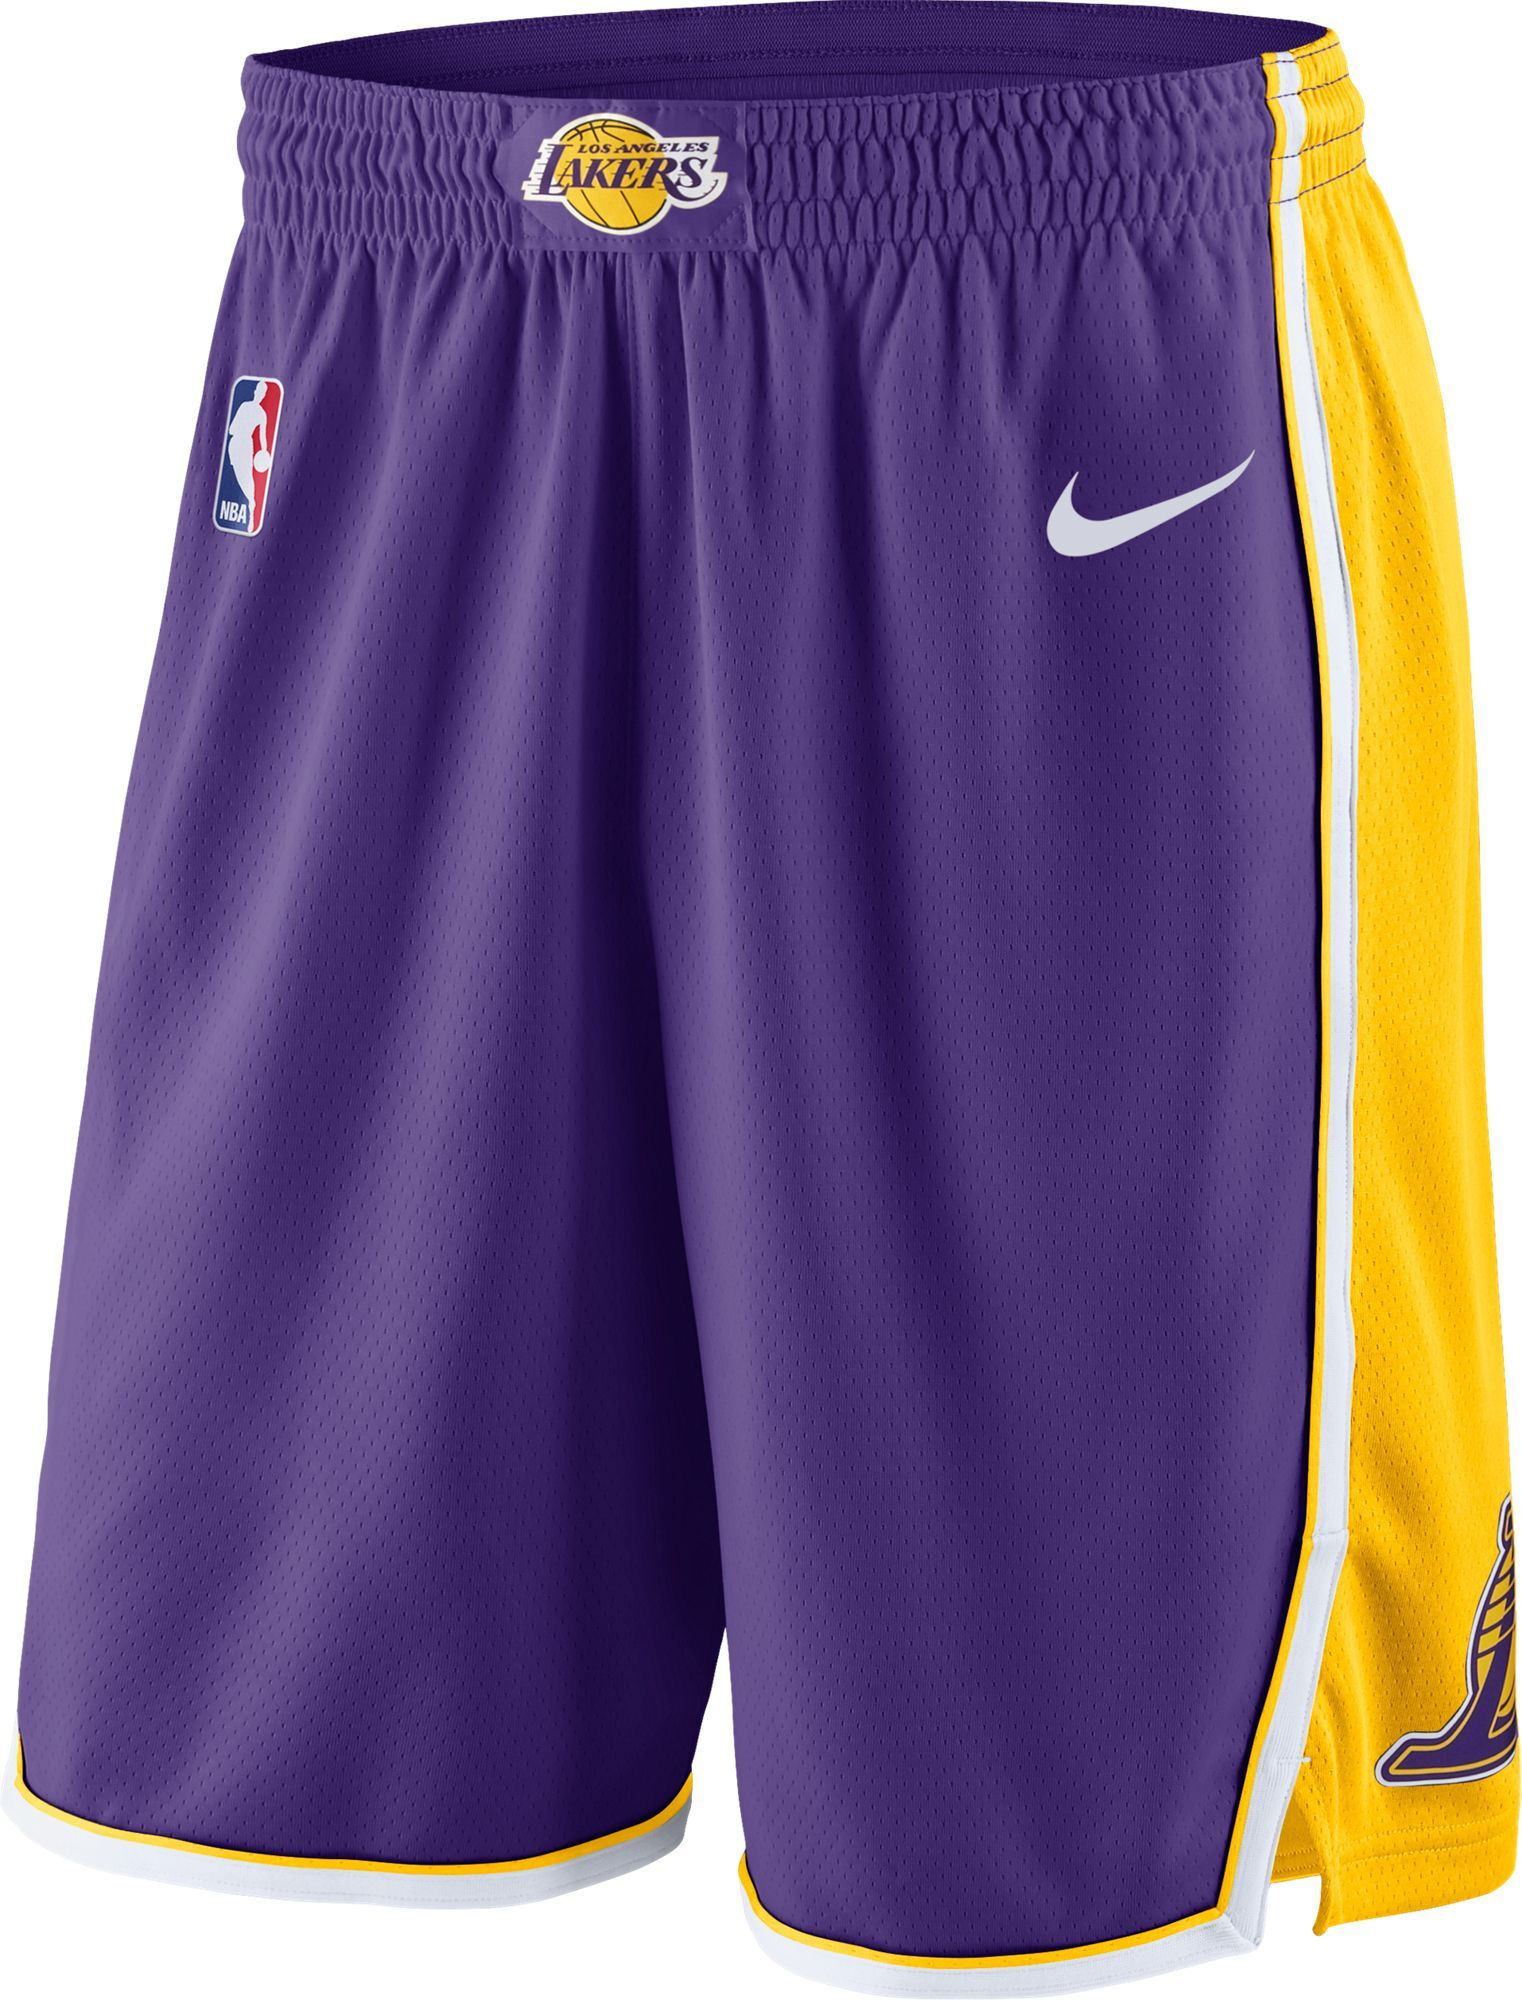 88a3fb3f Nike Men's Los Angeles Lakers Dri-FIT Purple Swingman Shorts, Size: Medium,  Team